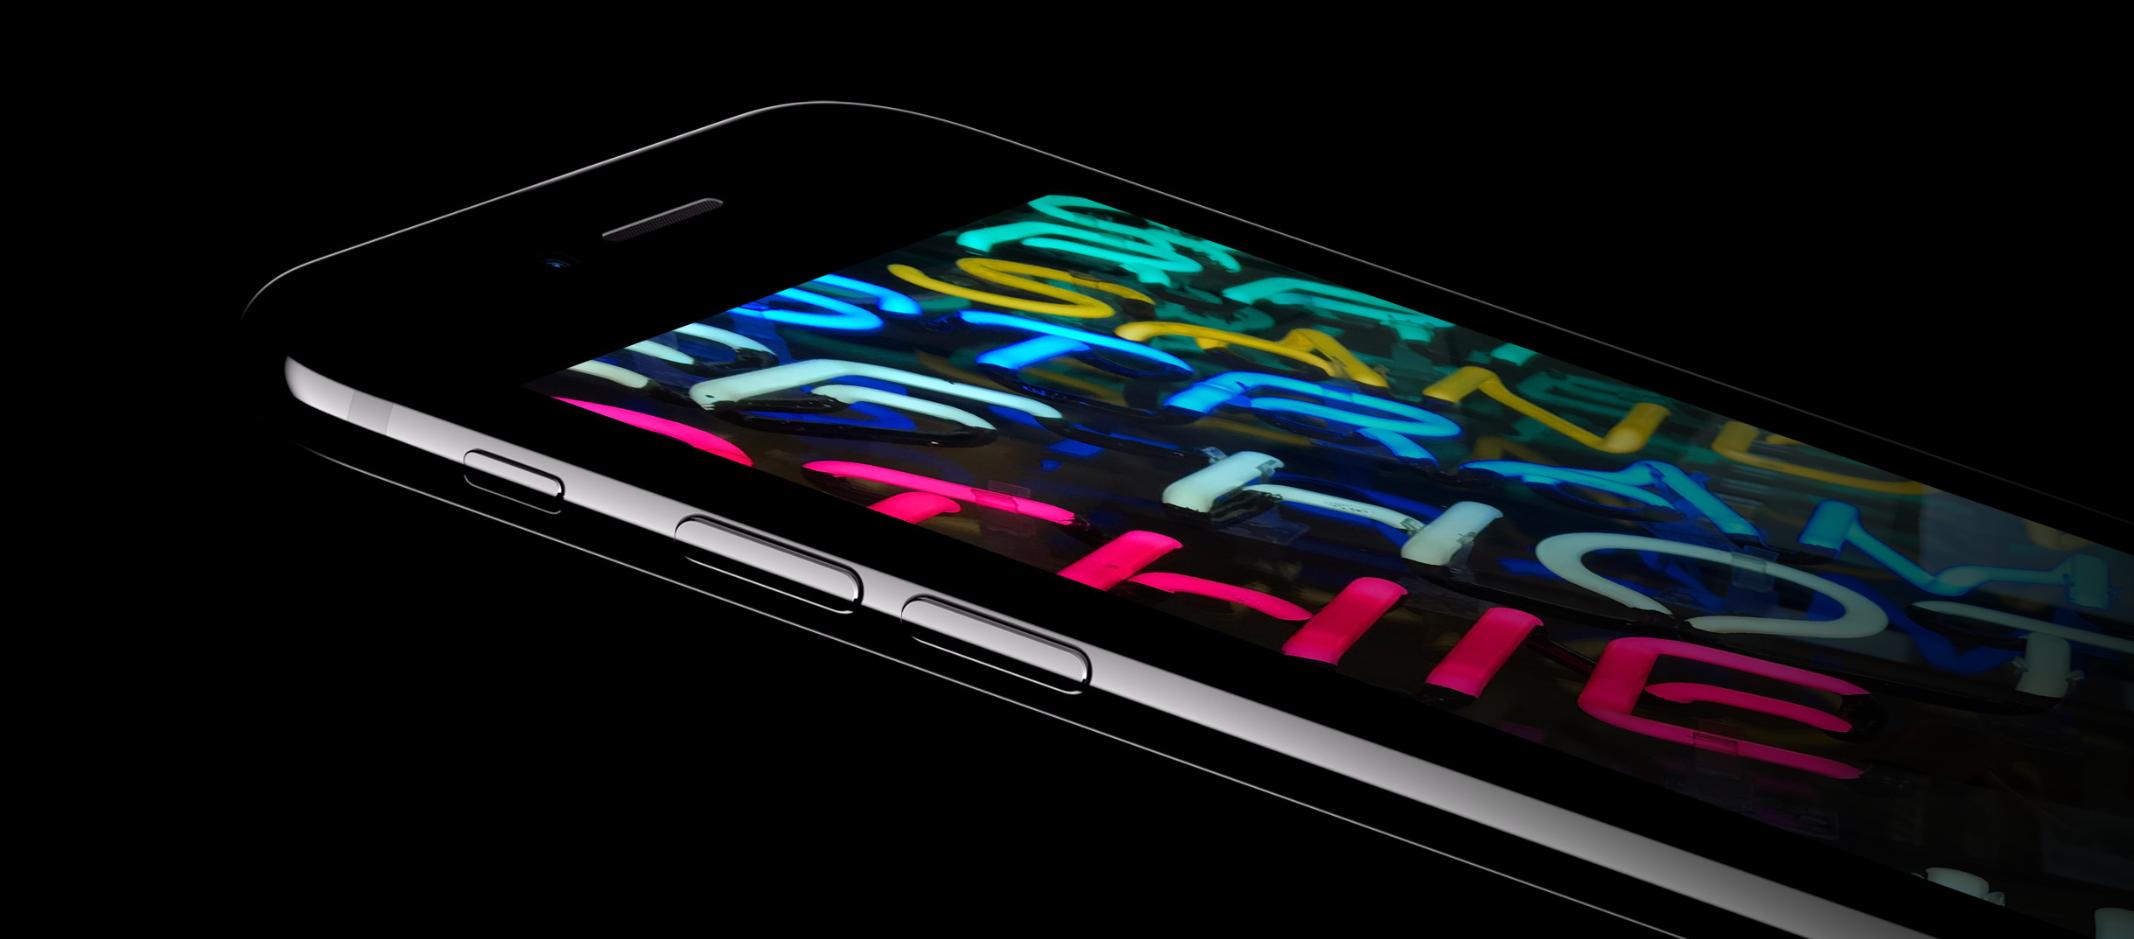 ip 7 screen